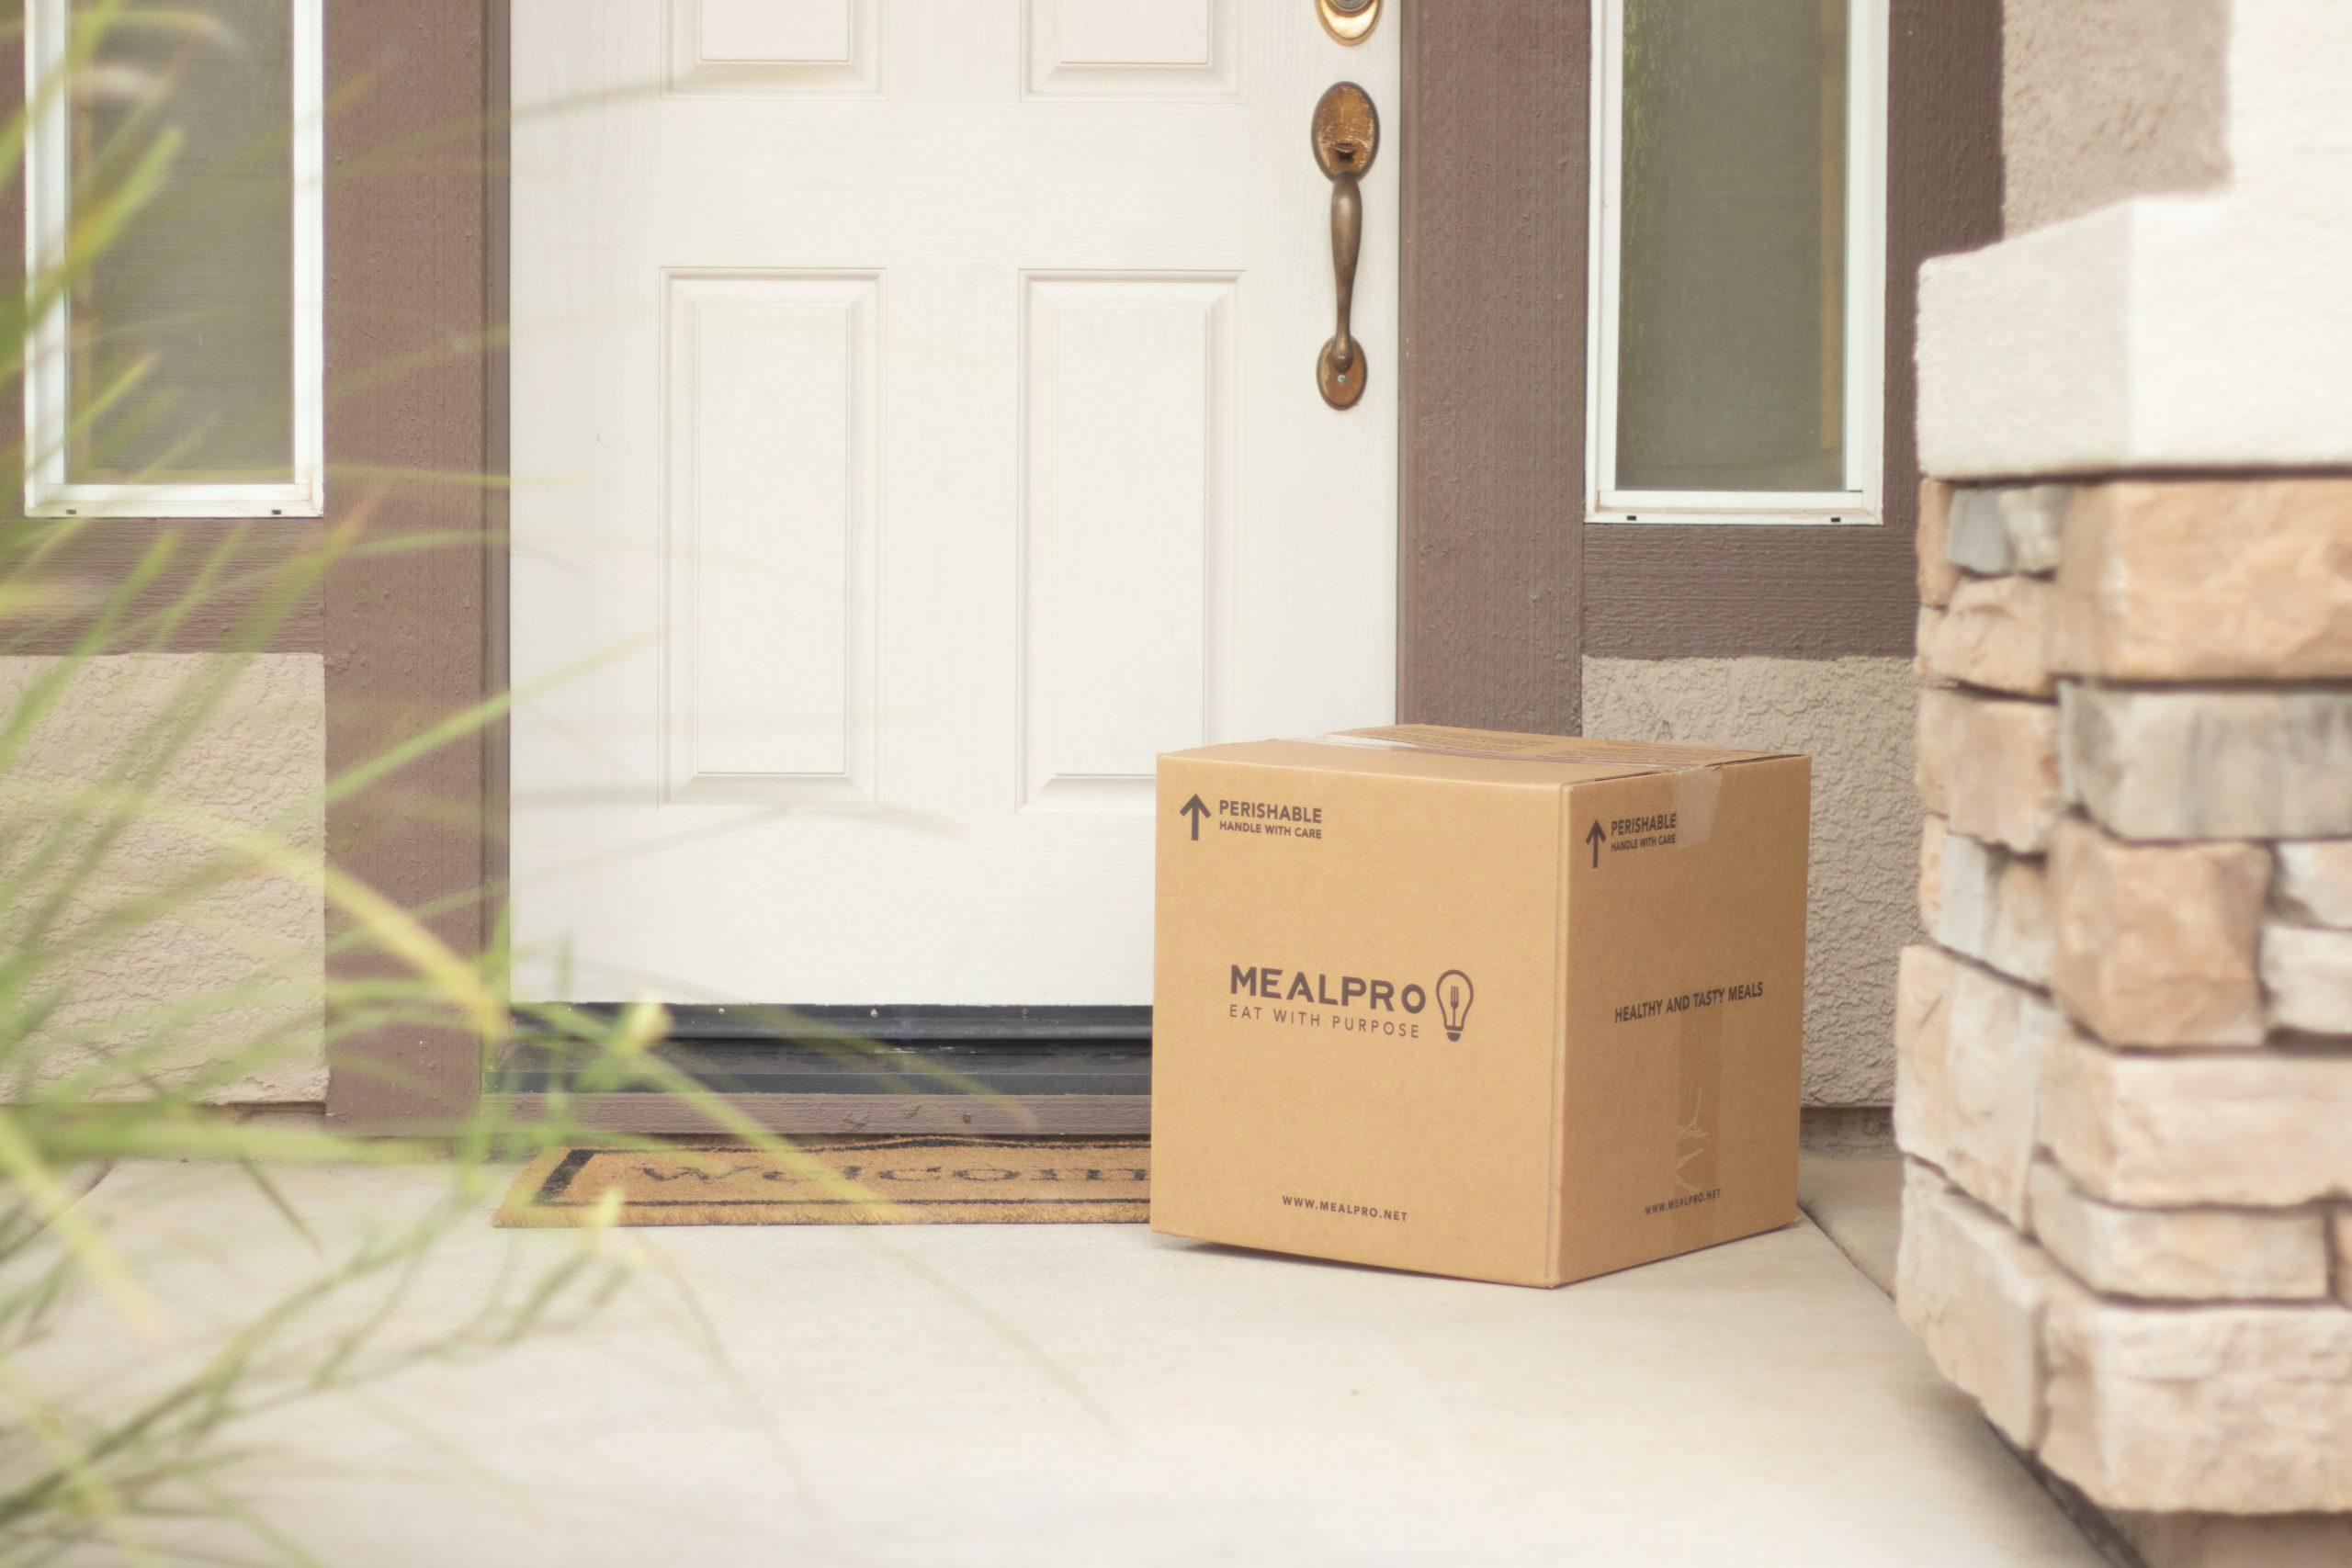 Hvordan sender man en pakke retur?